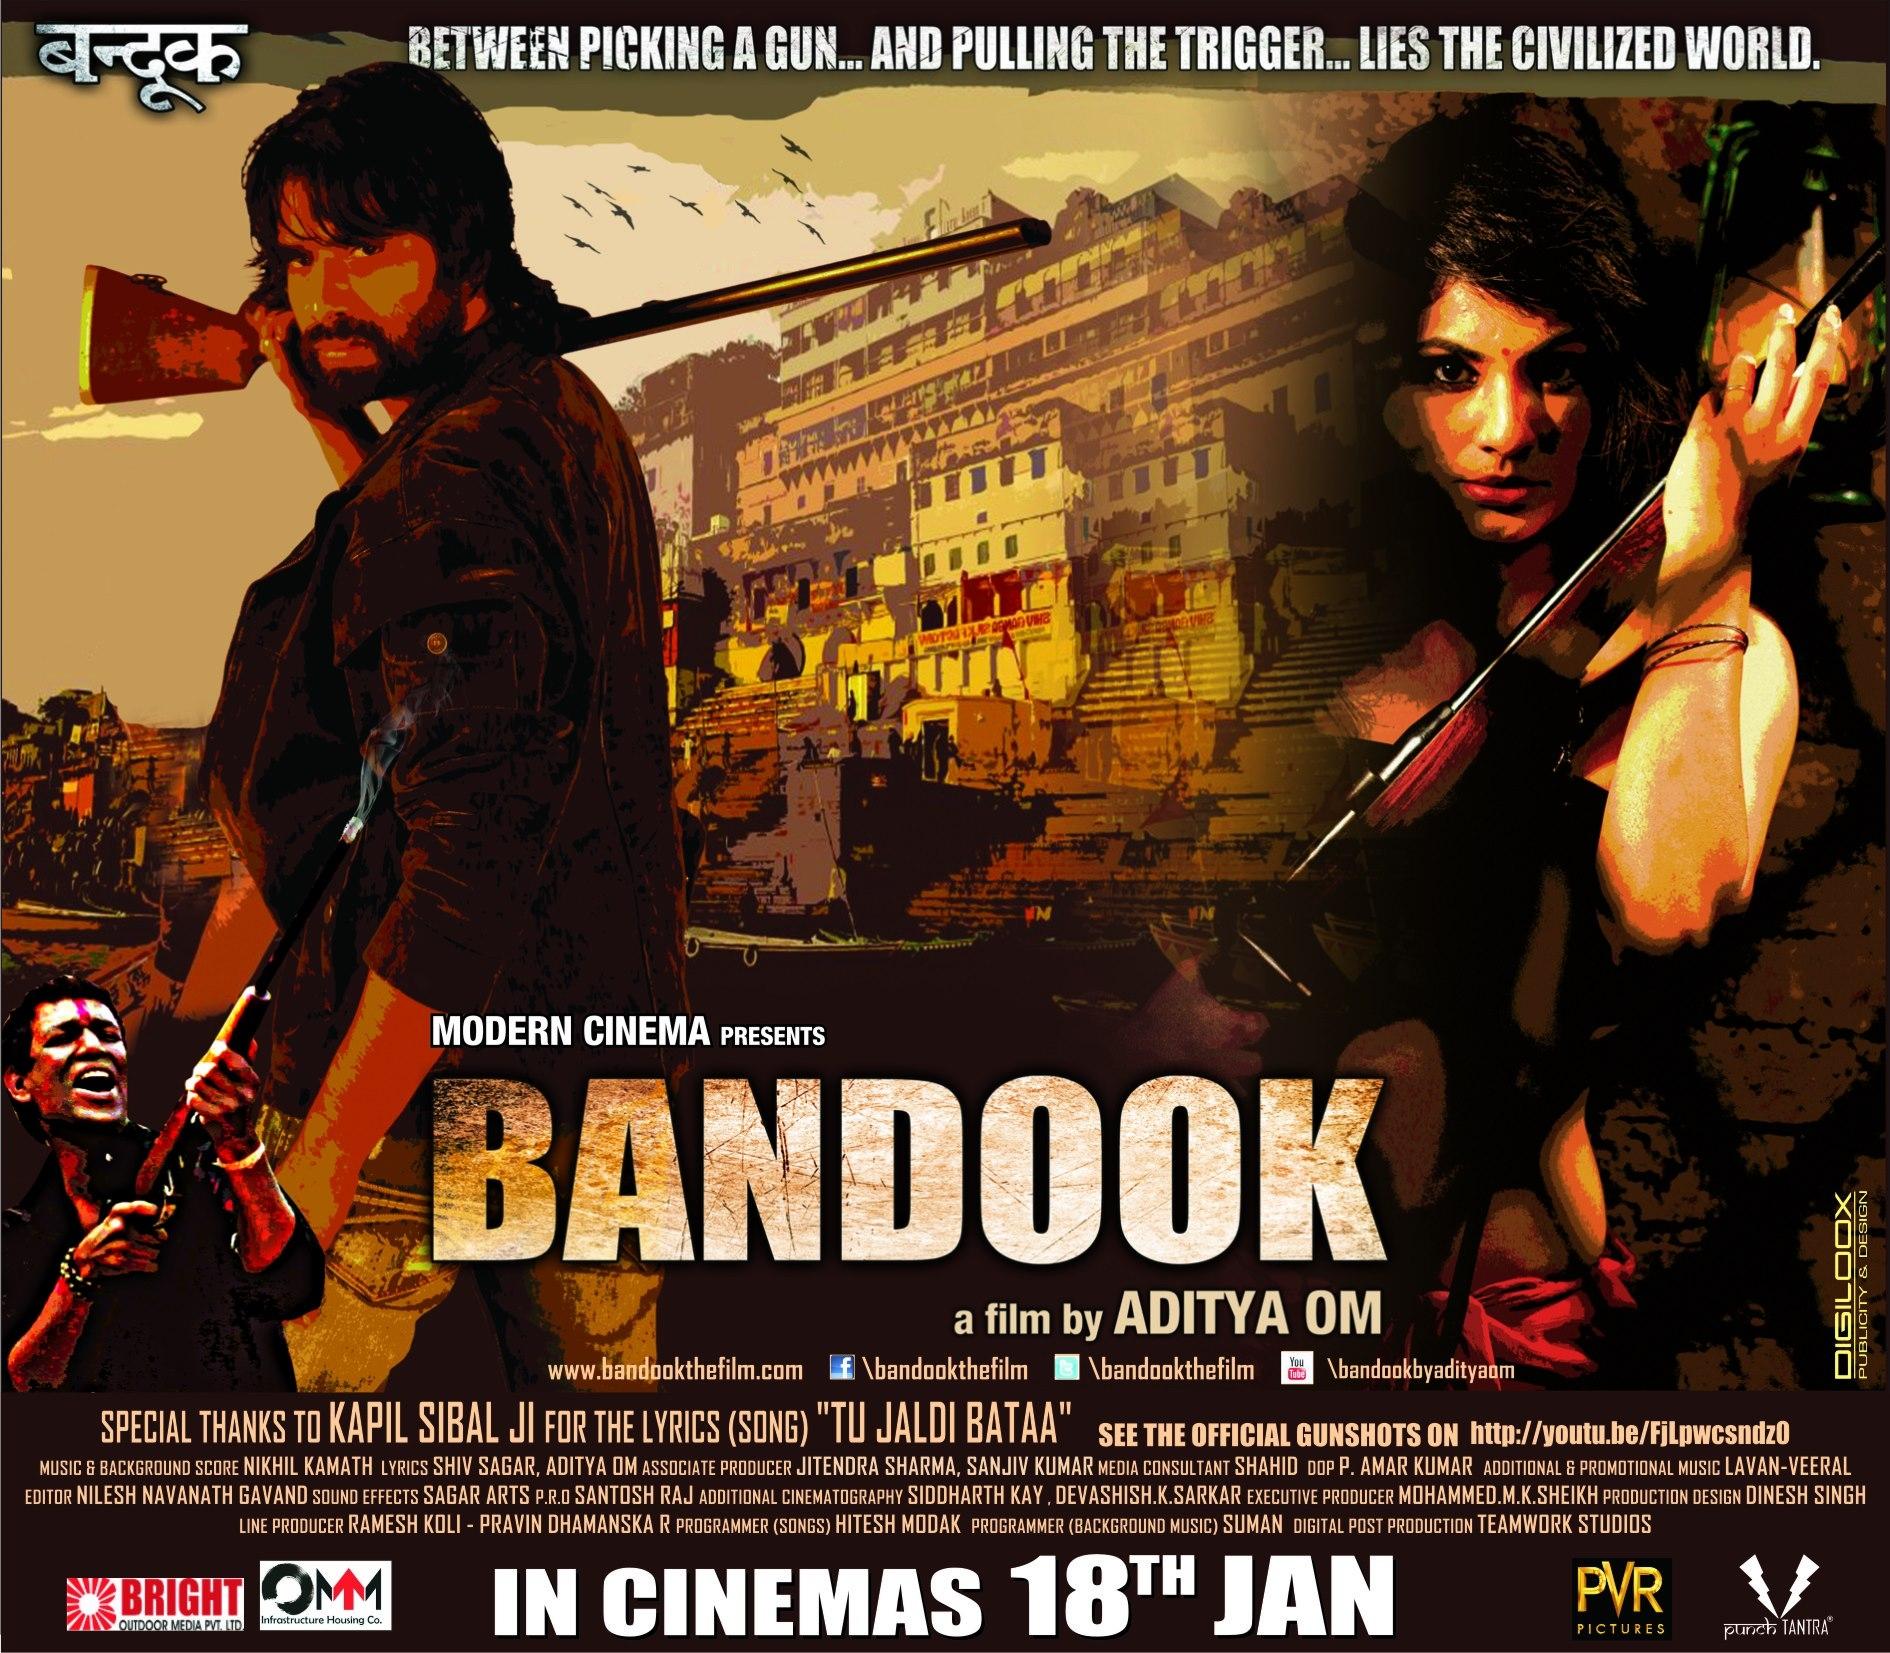 Bandook - Movie Poster #4 (Original)